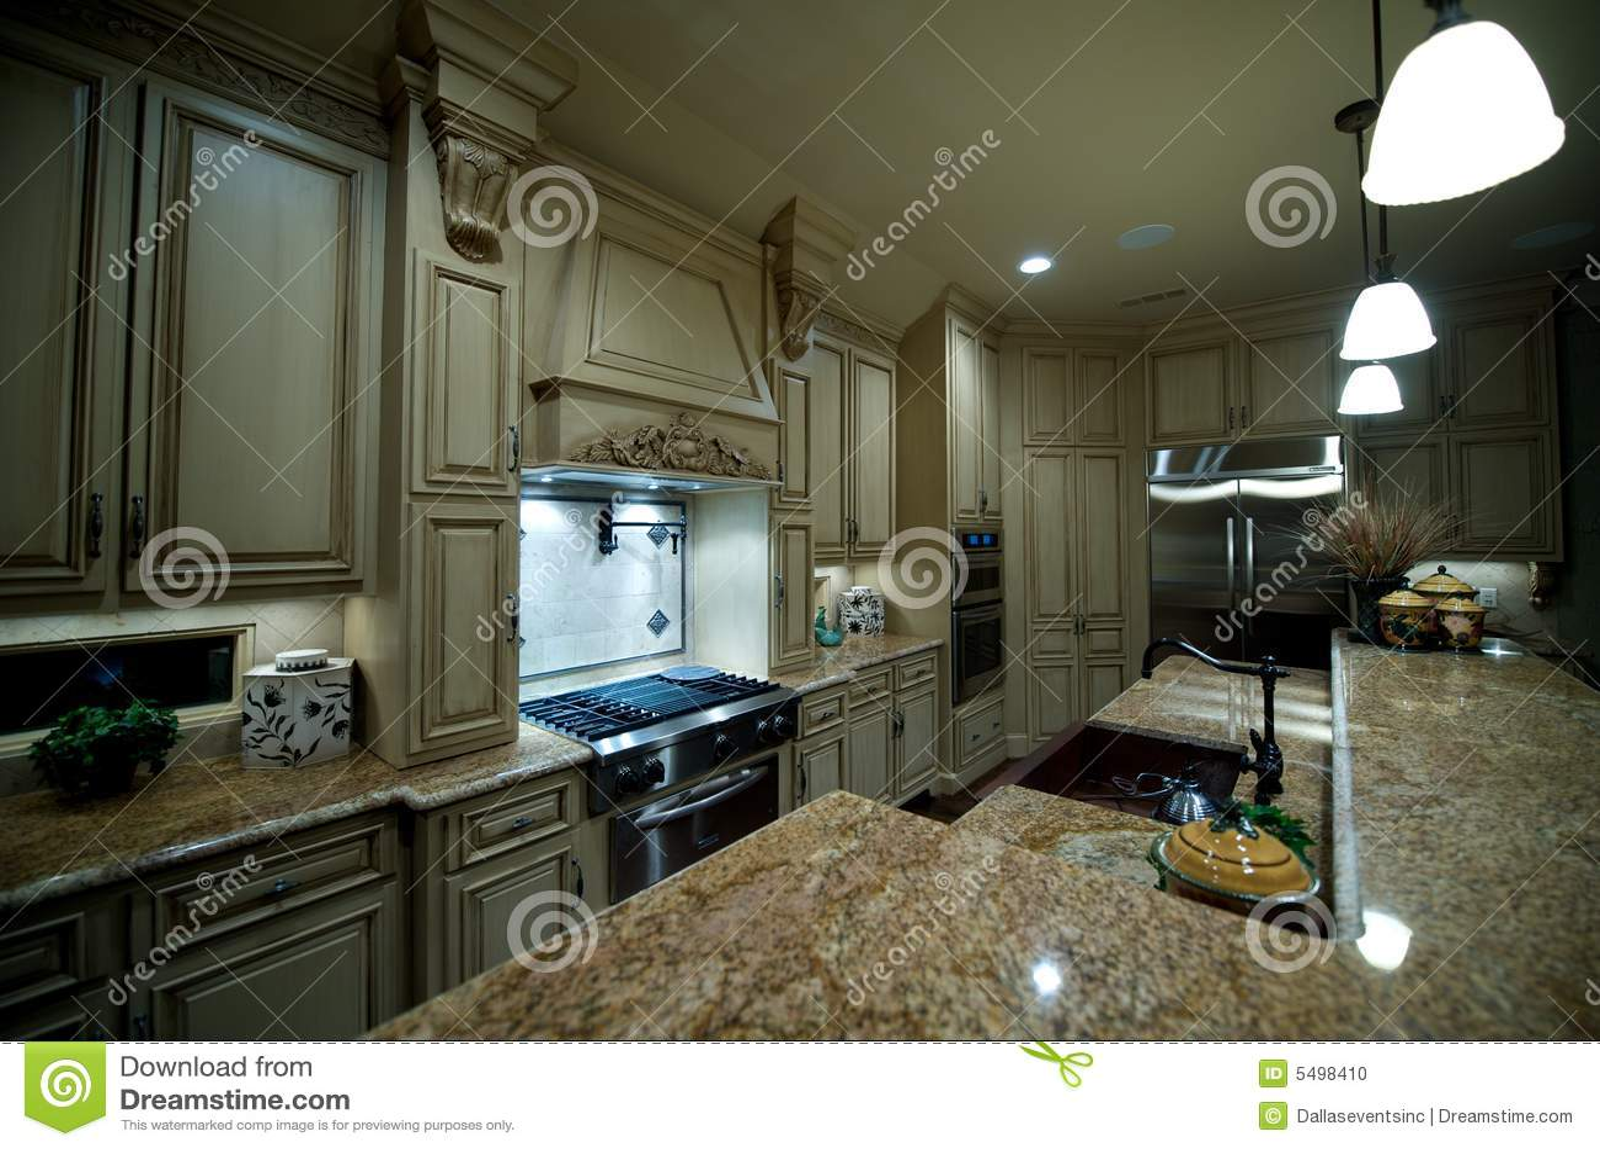 Upscale Kitchen With Granite Countertops Stock Photo